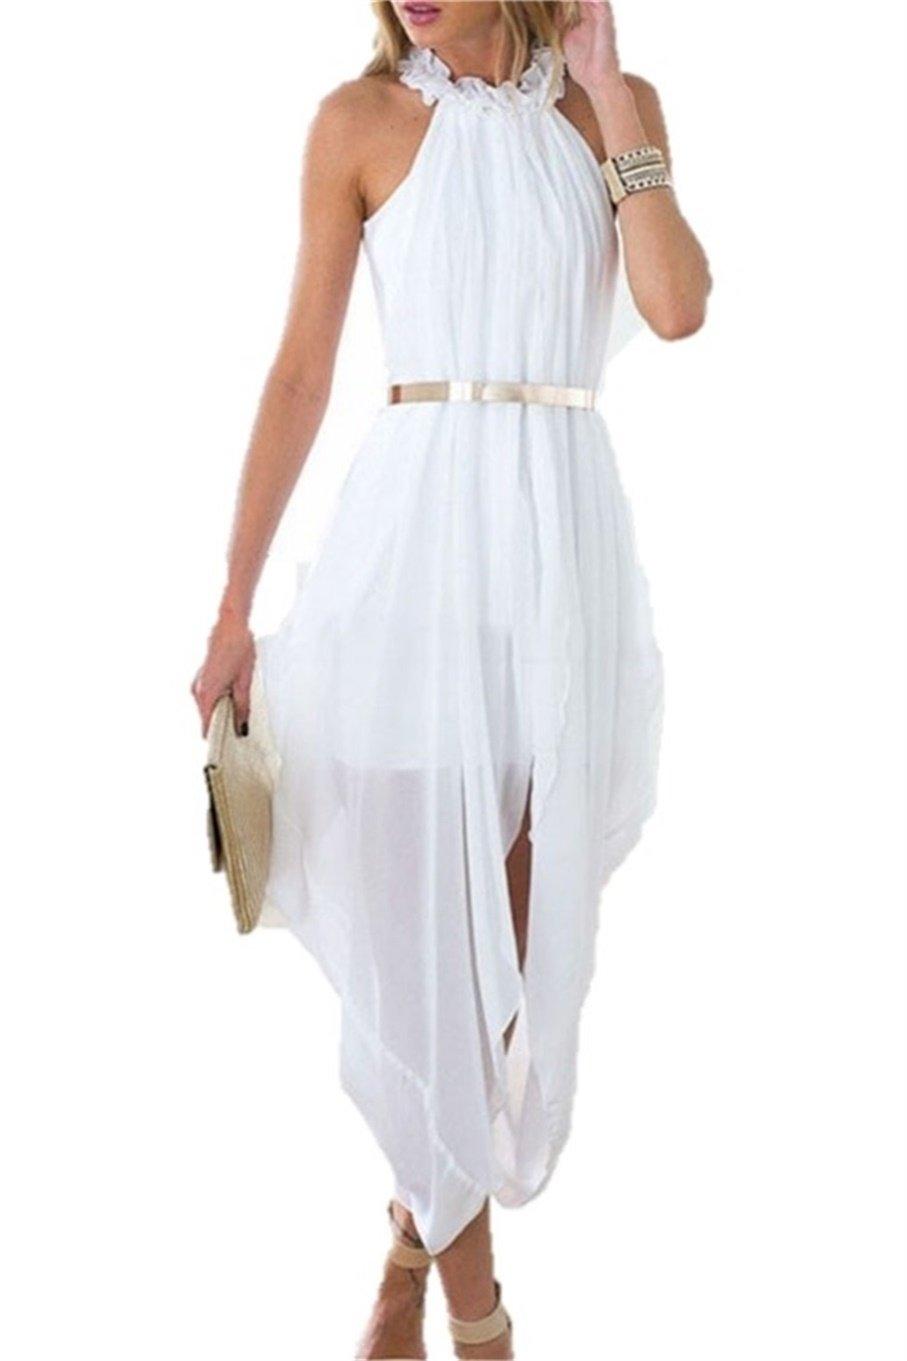 Shopall Elegant Women's White Sheer Chiffon Hi Low Dress with Gold Belt Plus Size